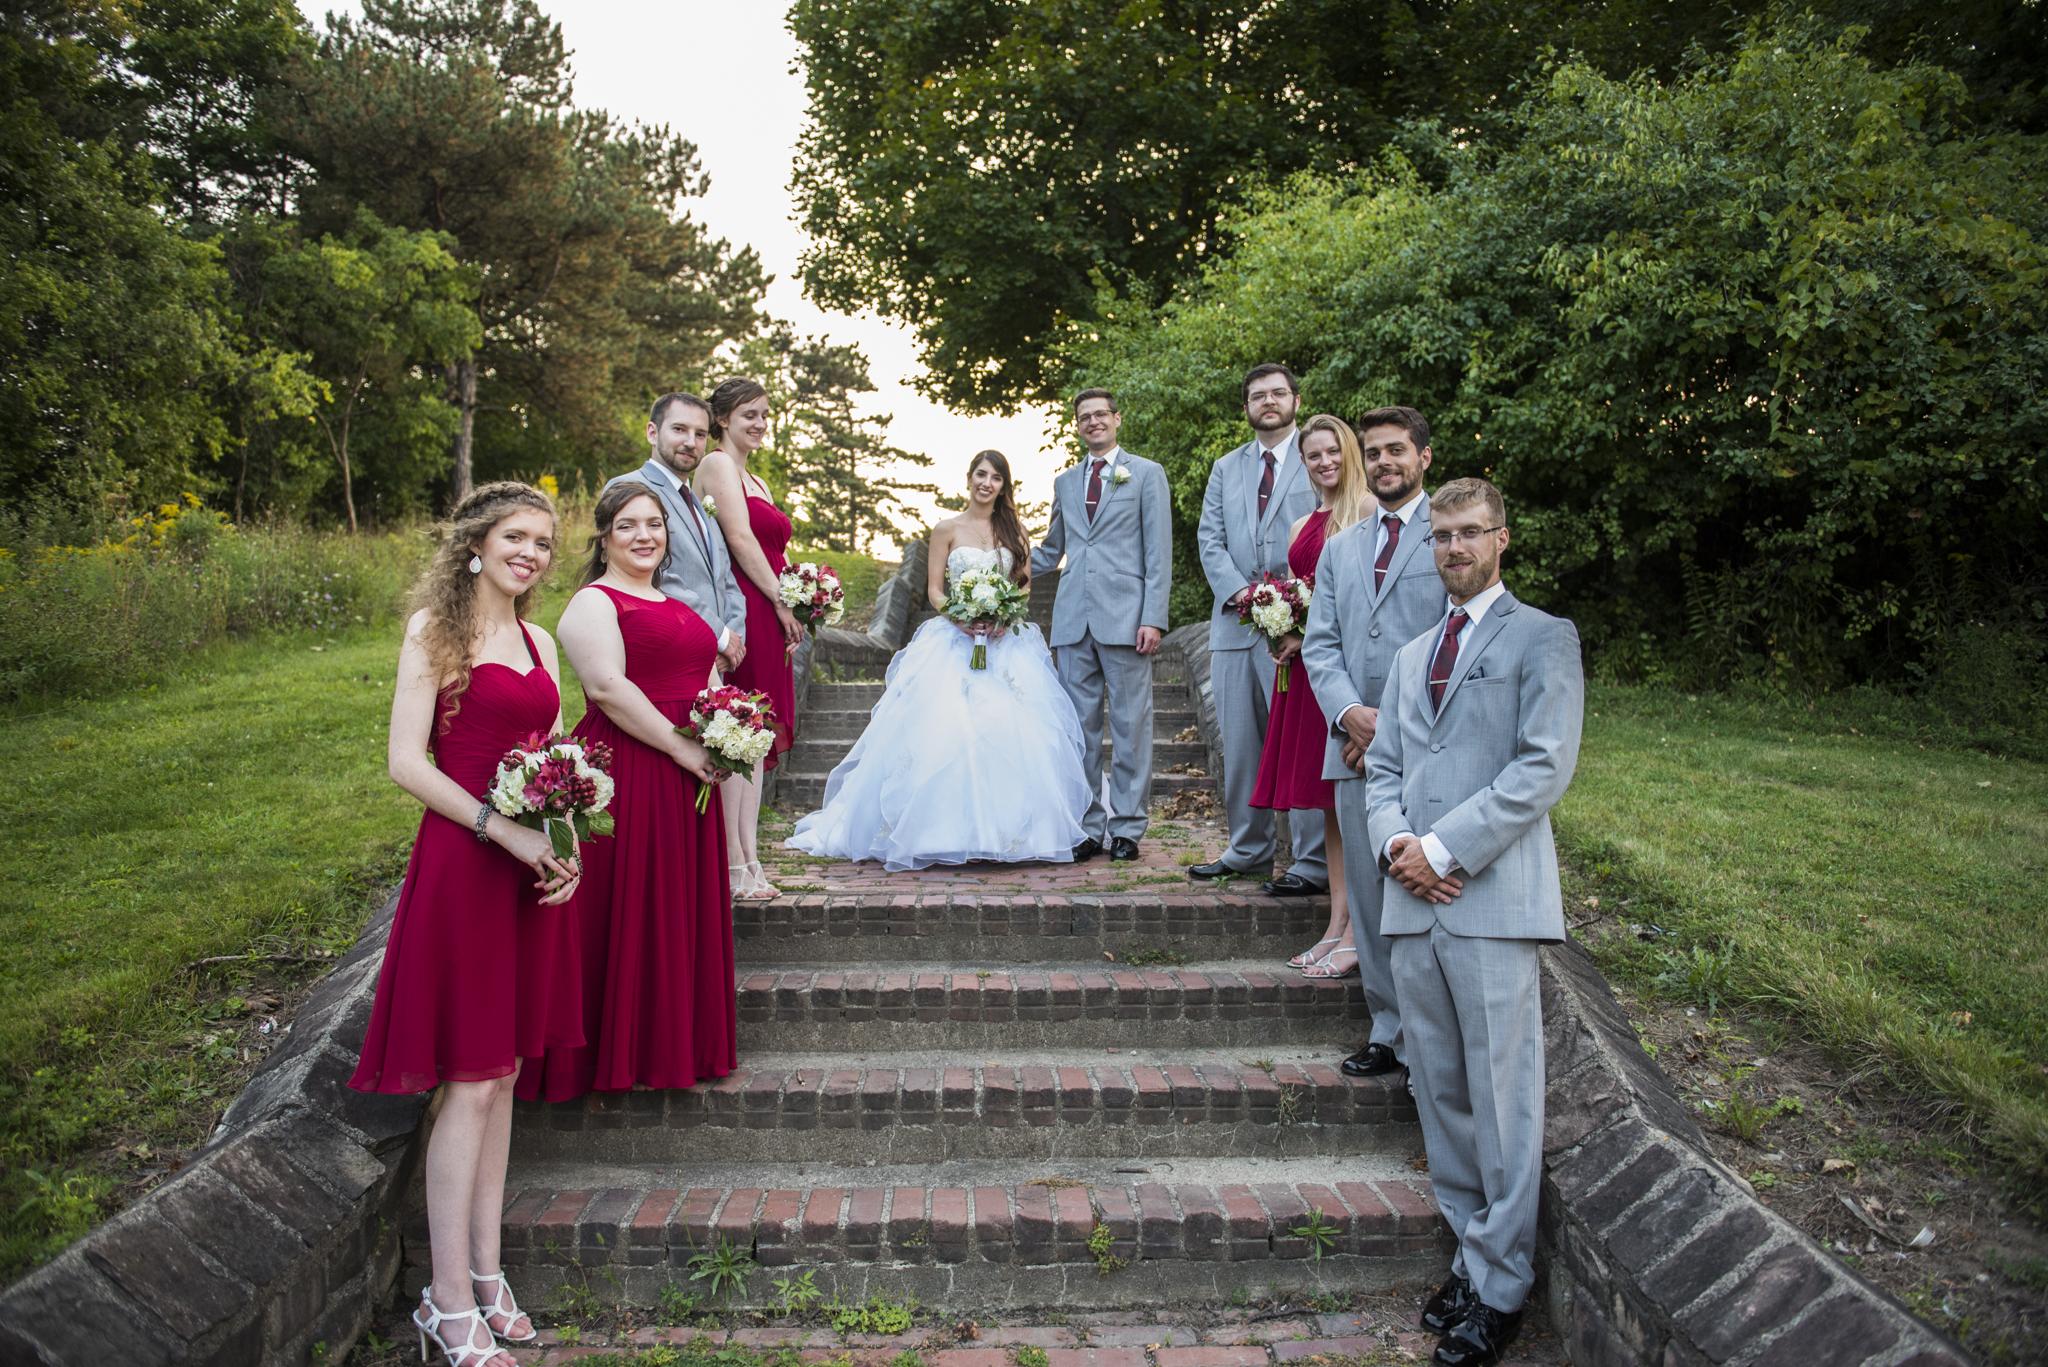 CA-OL-WeddingParty-46.jpg